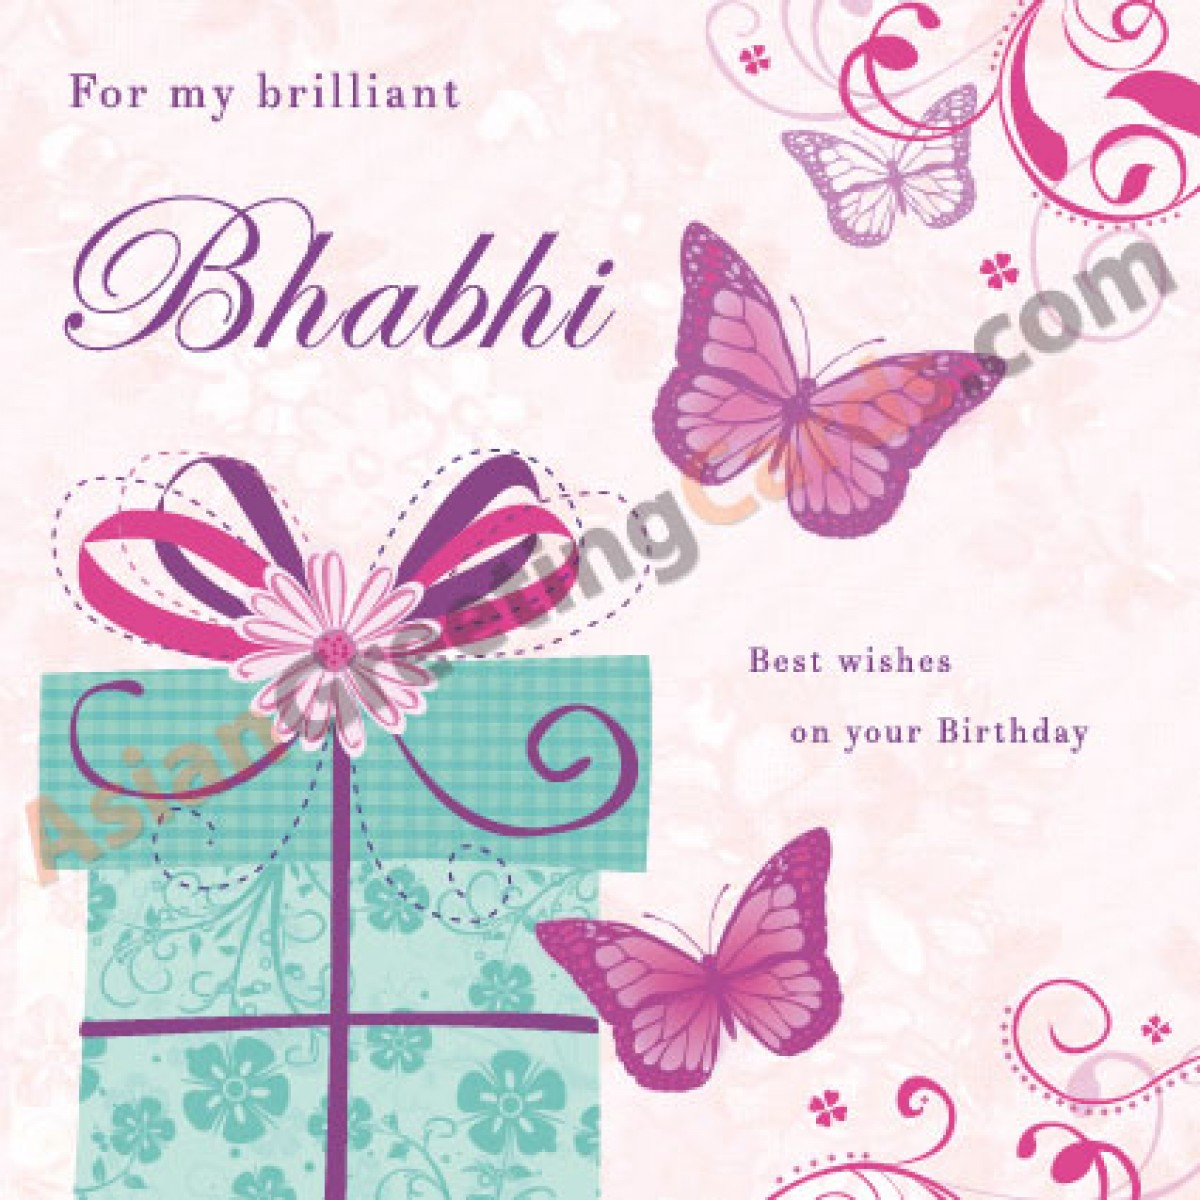 happy 2nd anniversary wishes